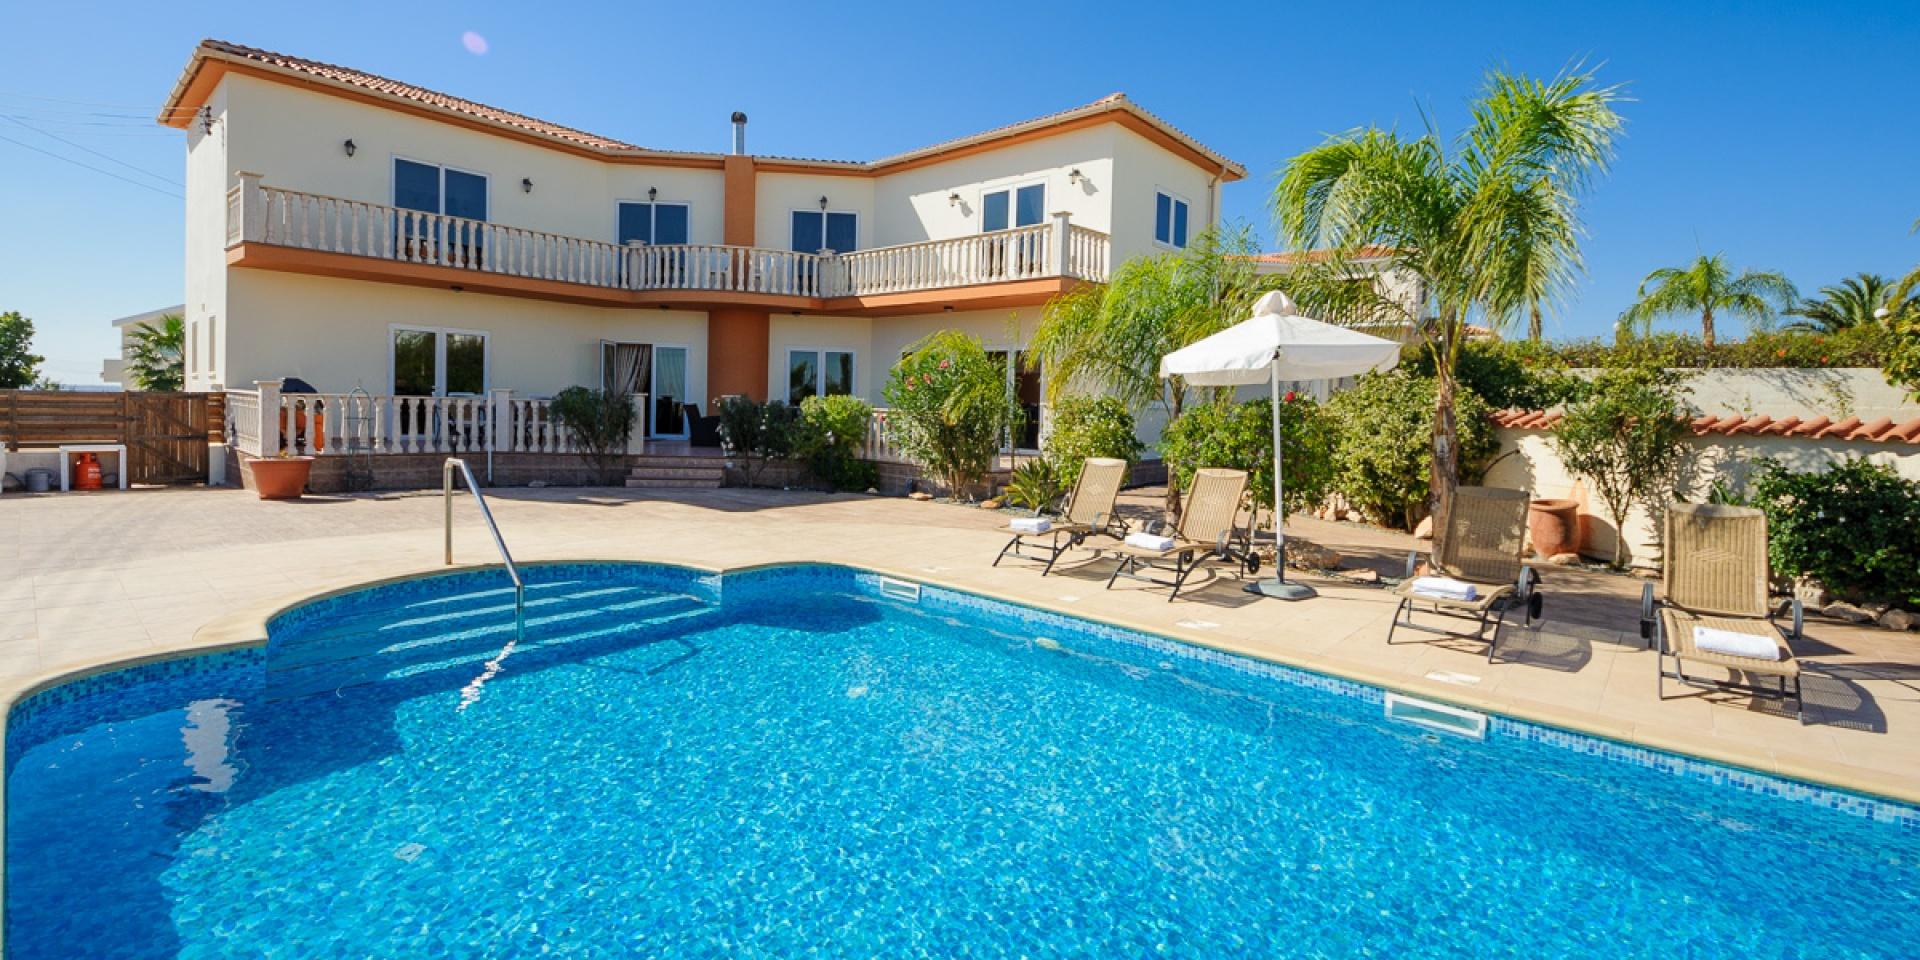 5 Bed Short Term Rental Villa Ayia Napa